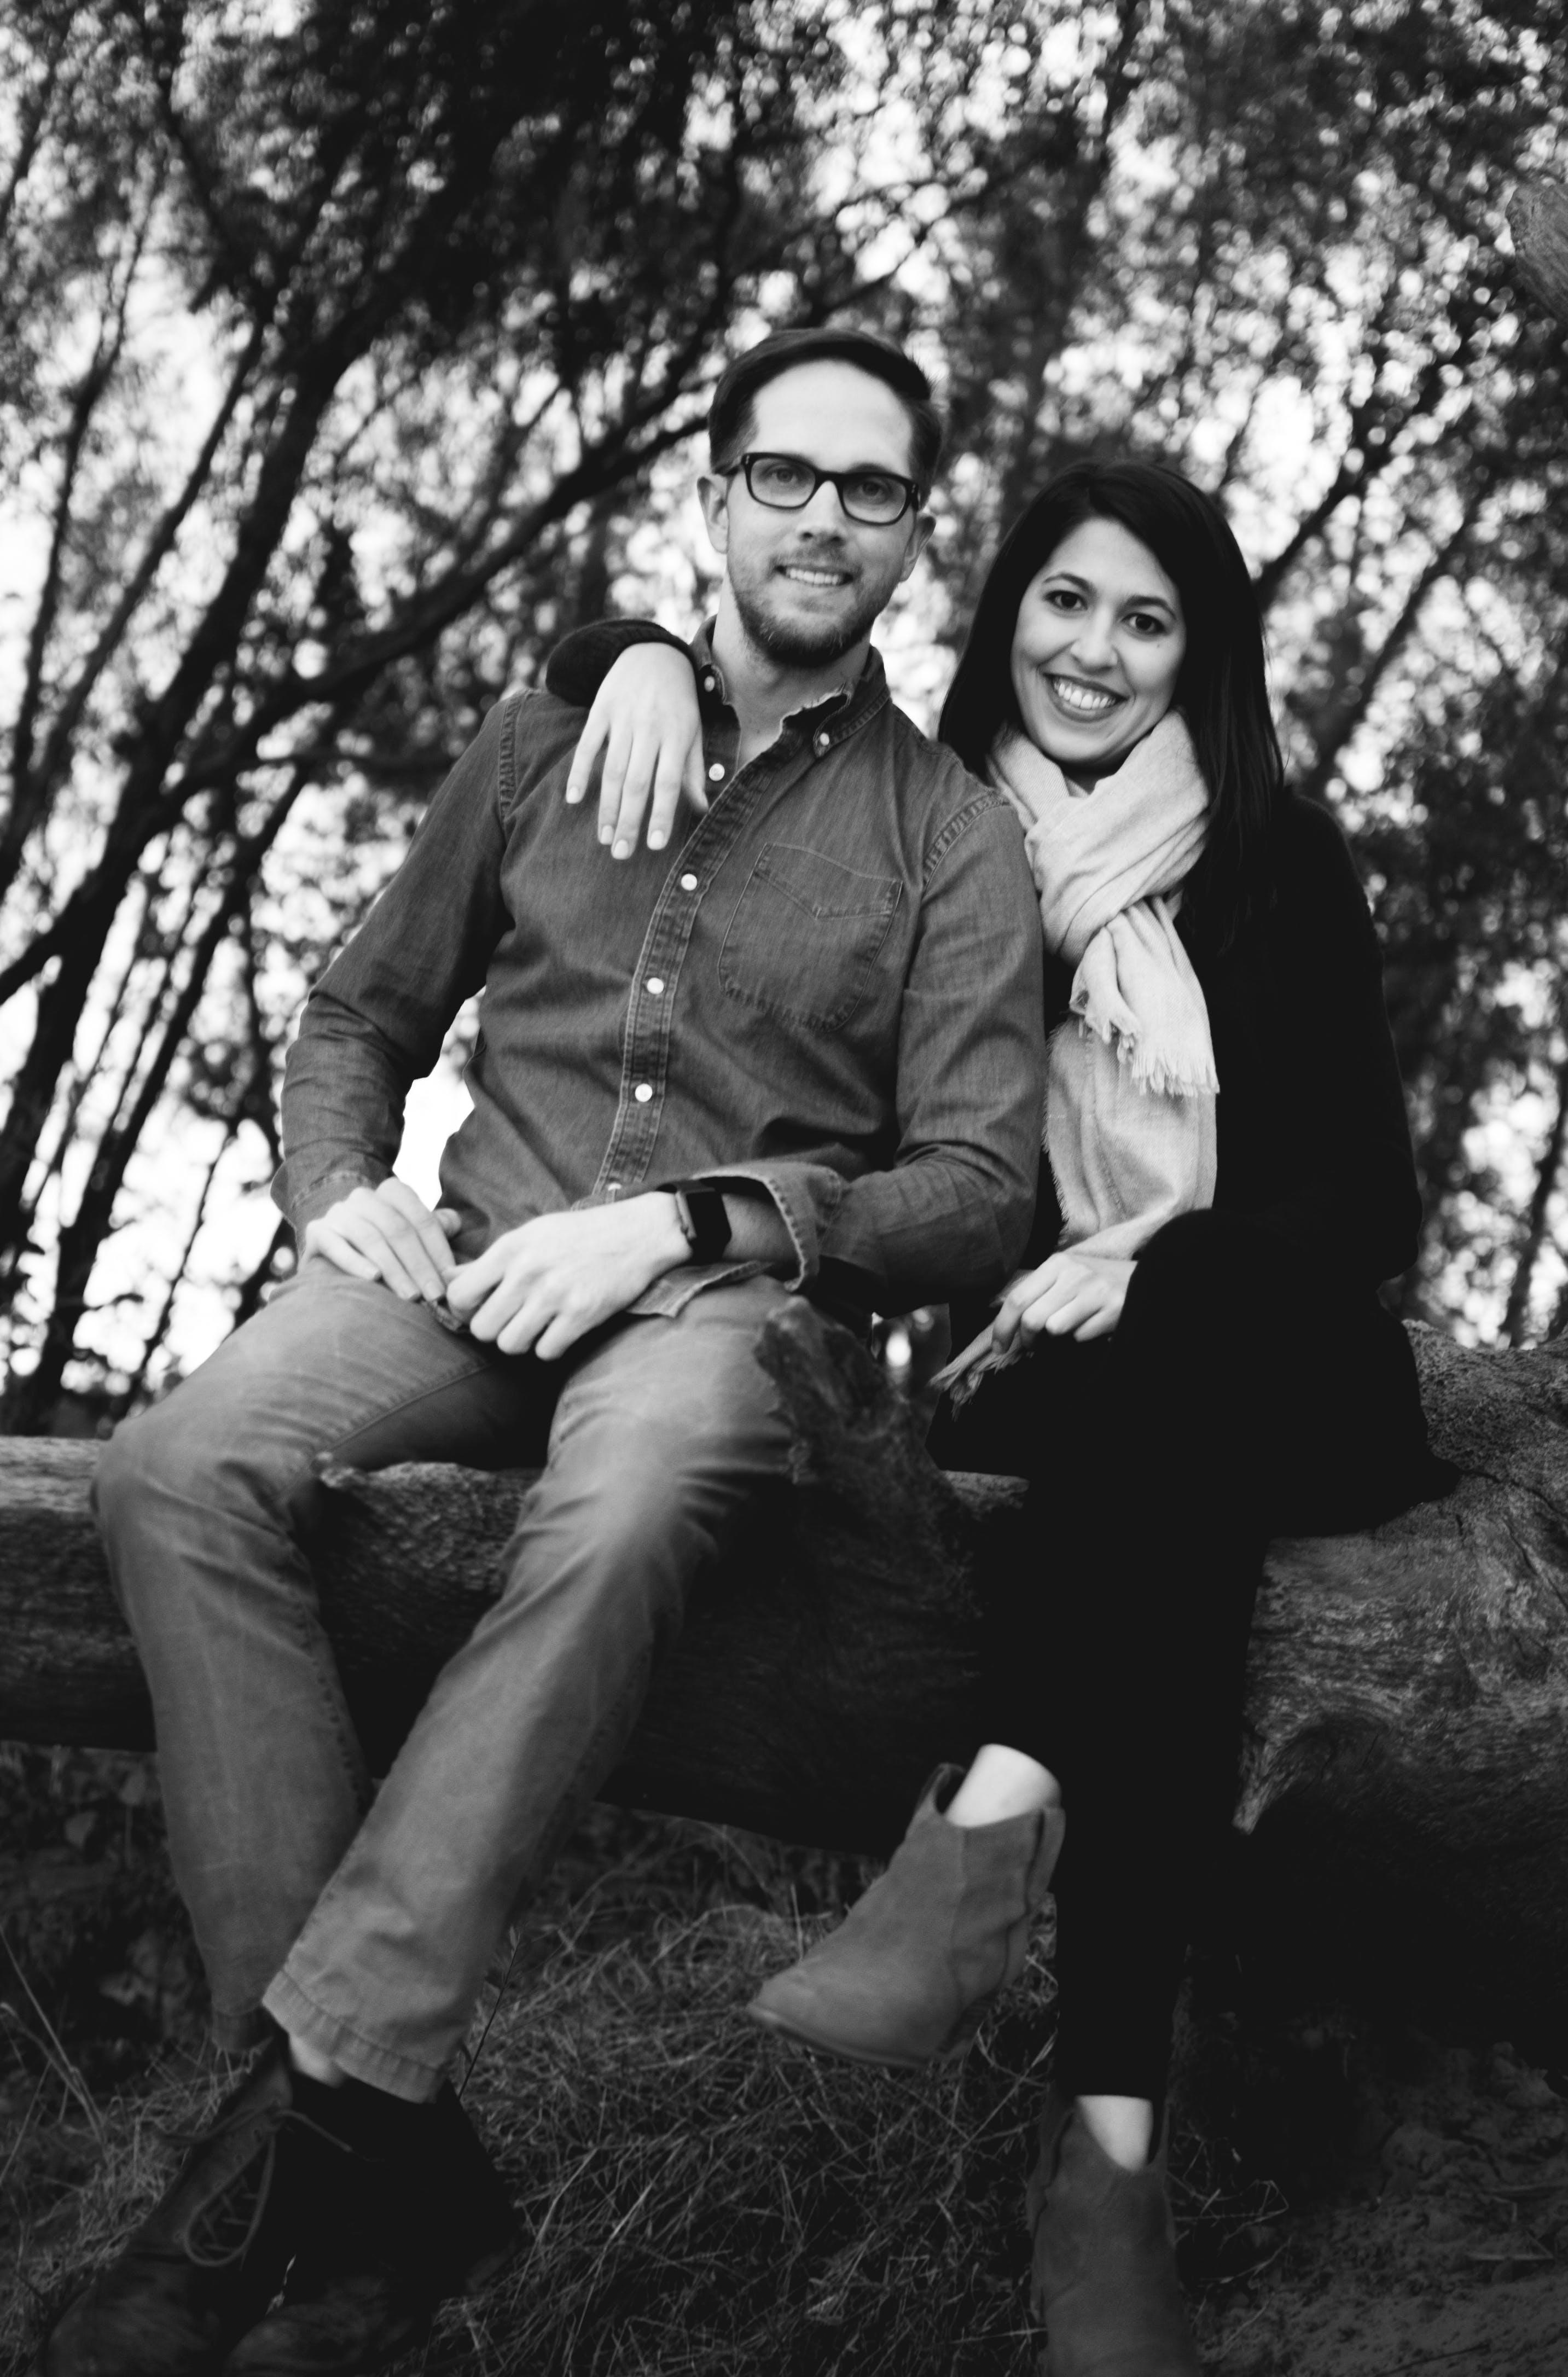 Free stock photo of fashion, couple, love, trees